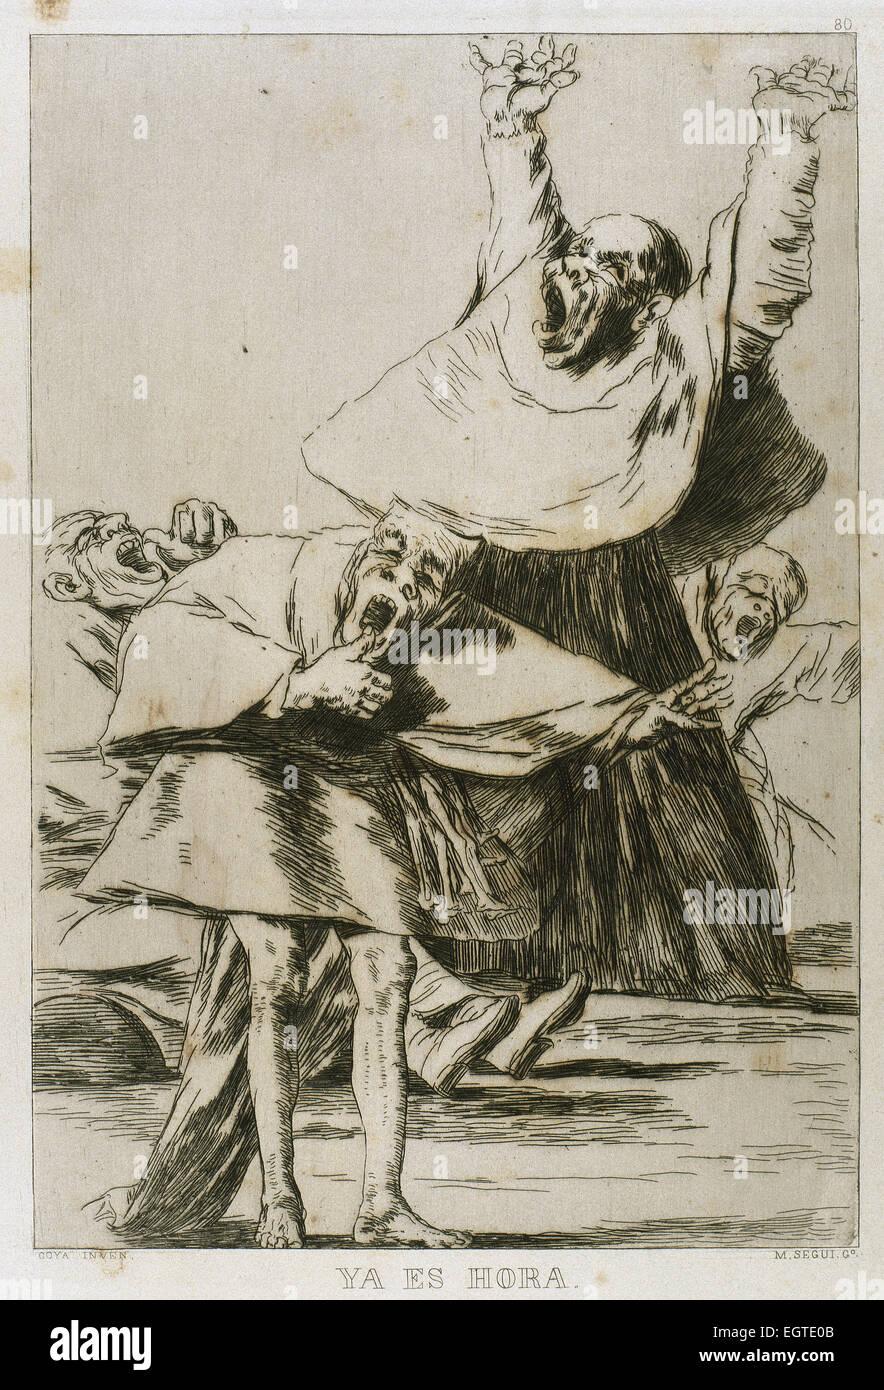 Francisco Goya (1746-1828). Caprices. Plaque 80. 18th century. It is time. Prado Museum. Madrid. - Stock Image